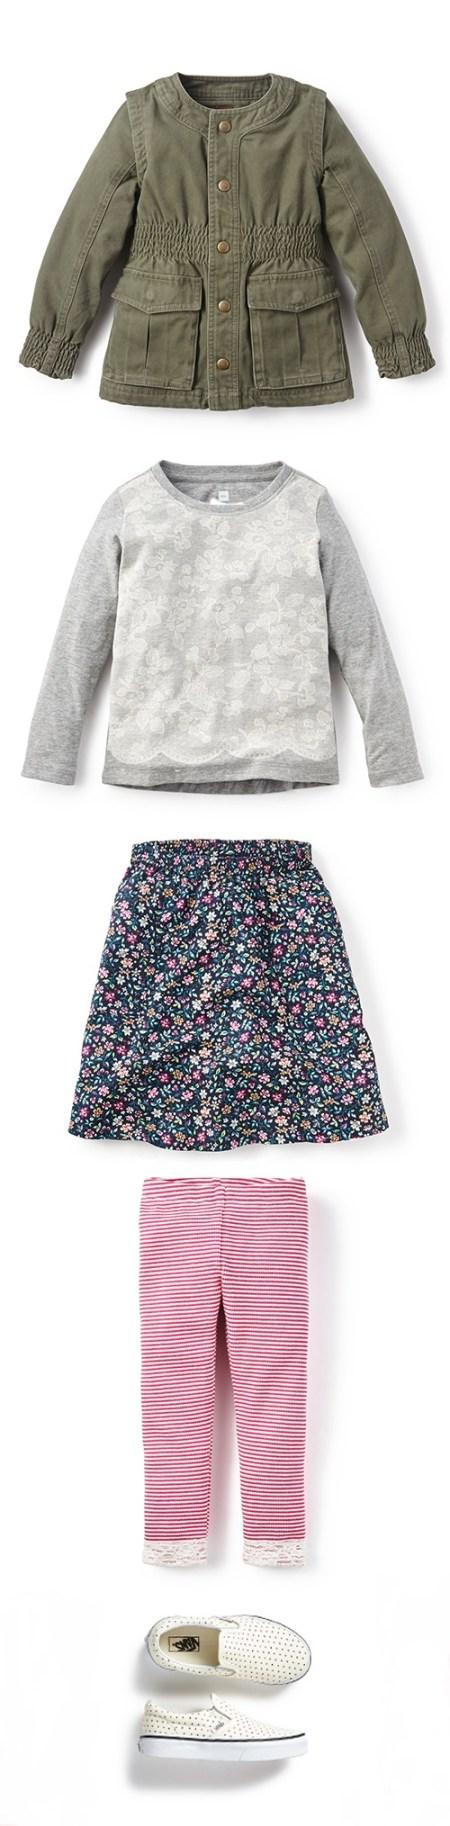 Midi Skirt Play